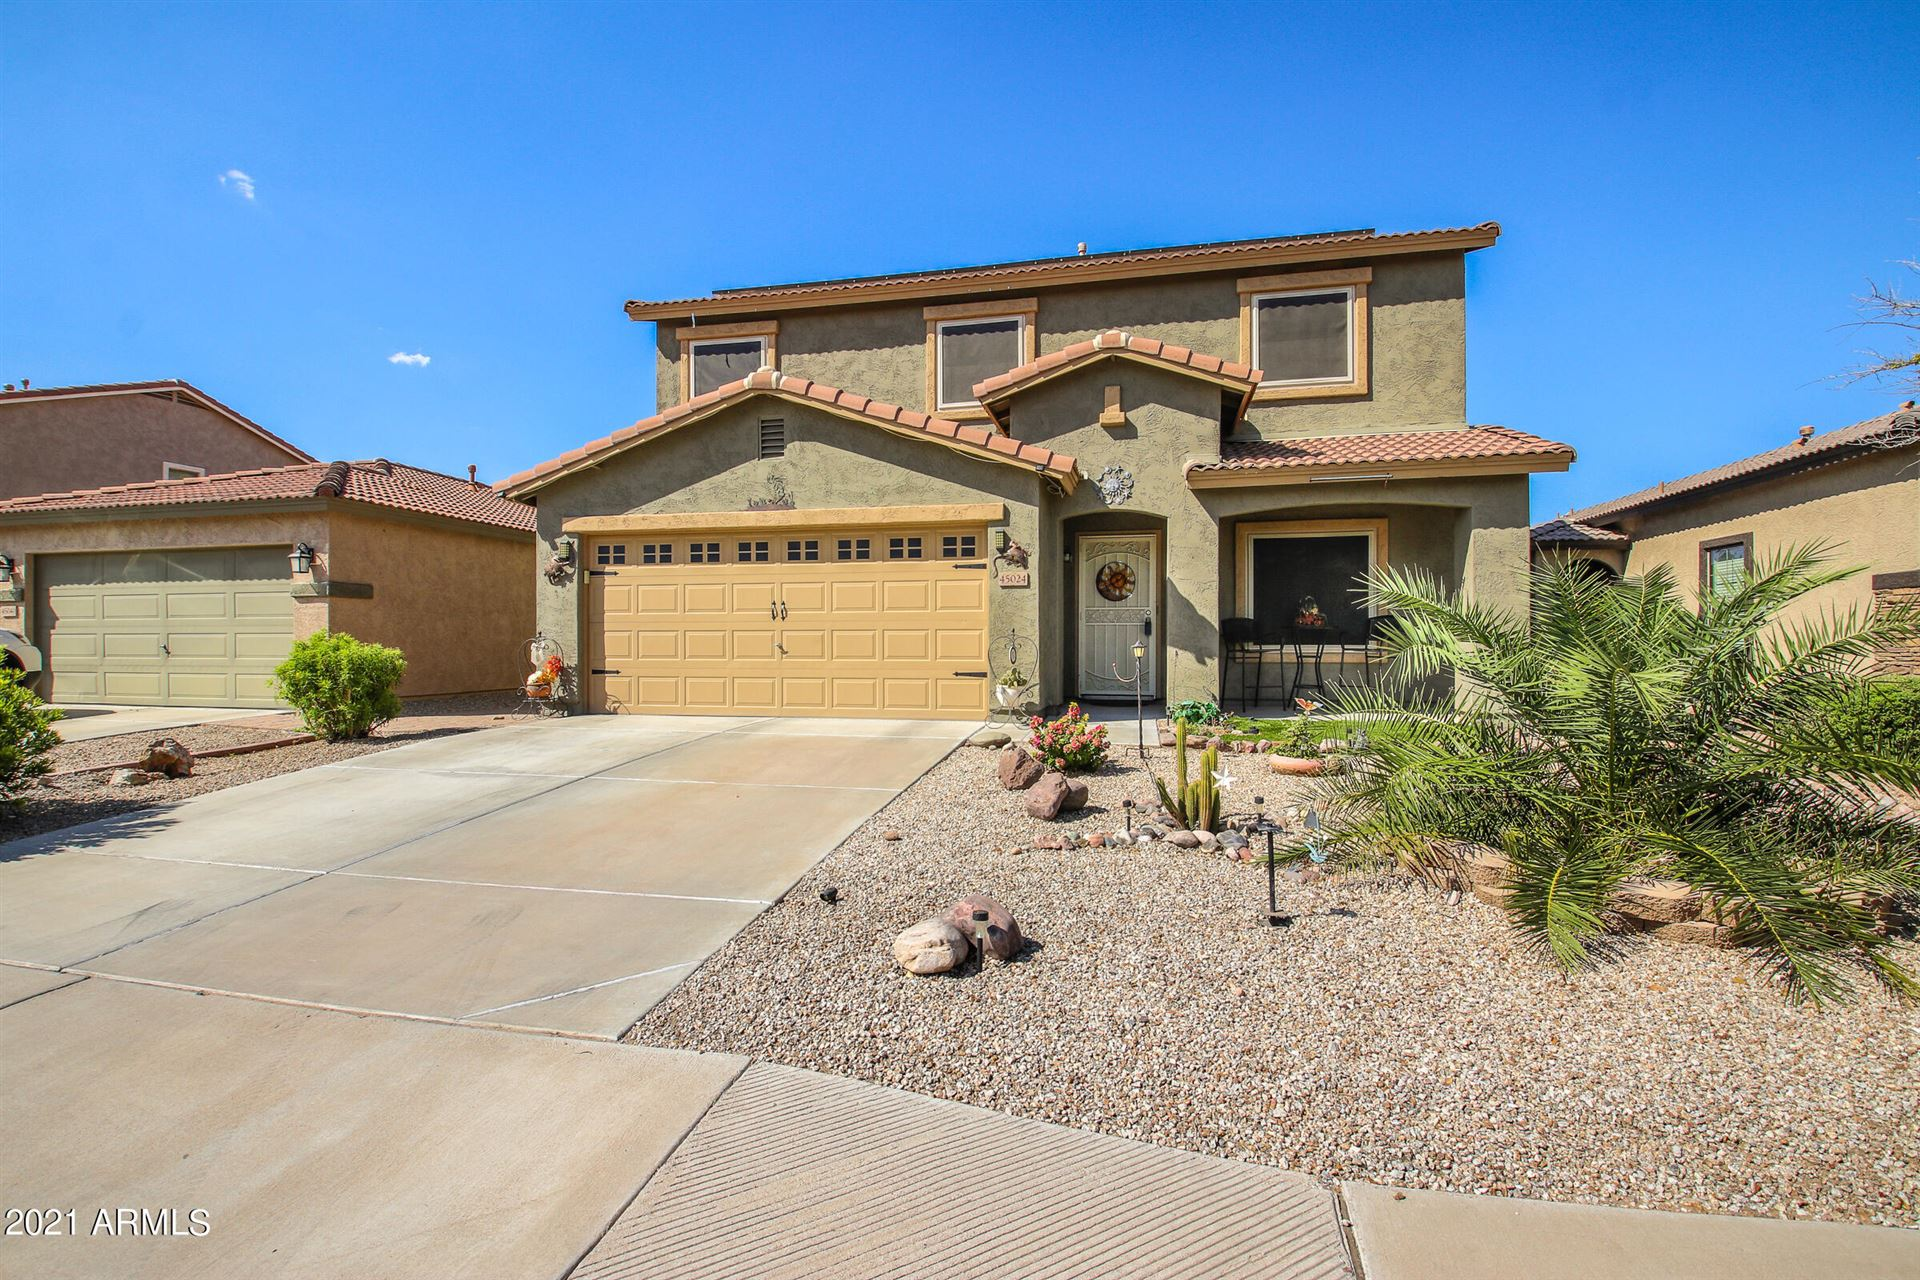 45024 W MIRAMAR Road, Maricopa, AZ 85139 - #: 6296027